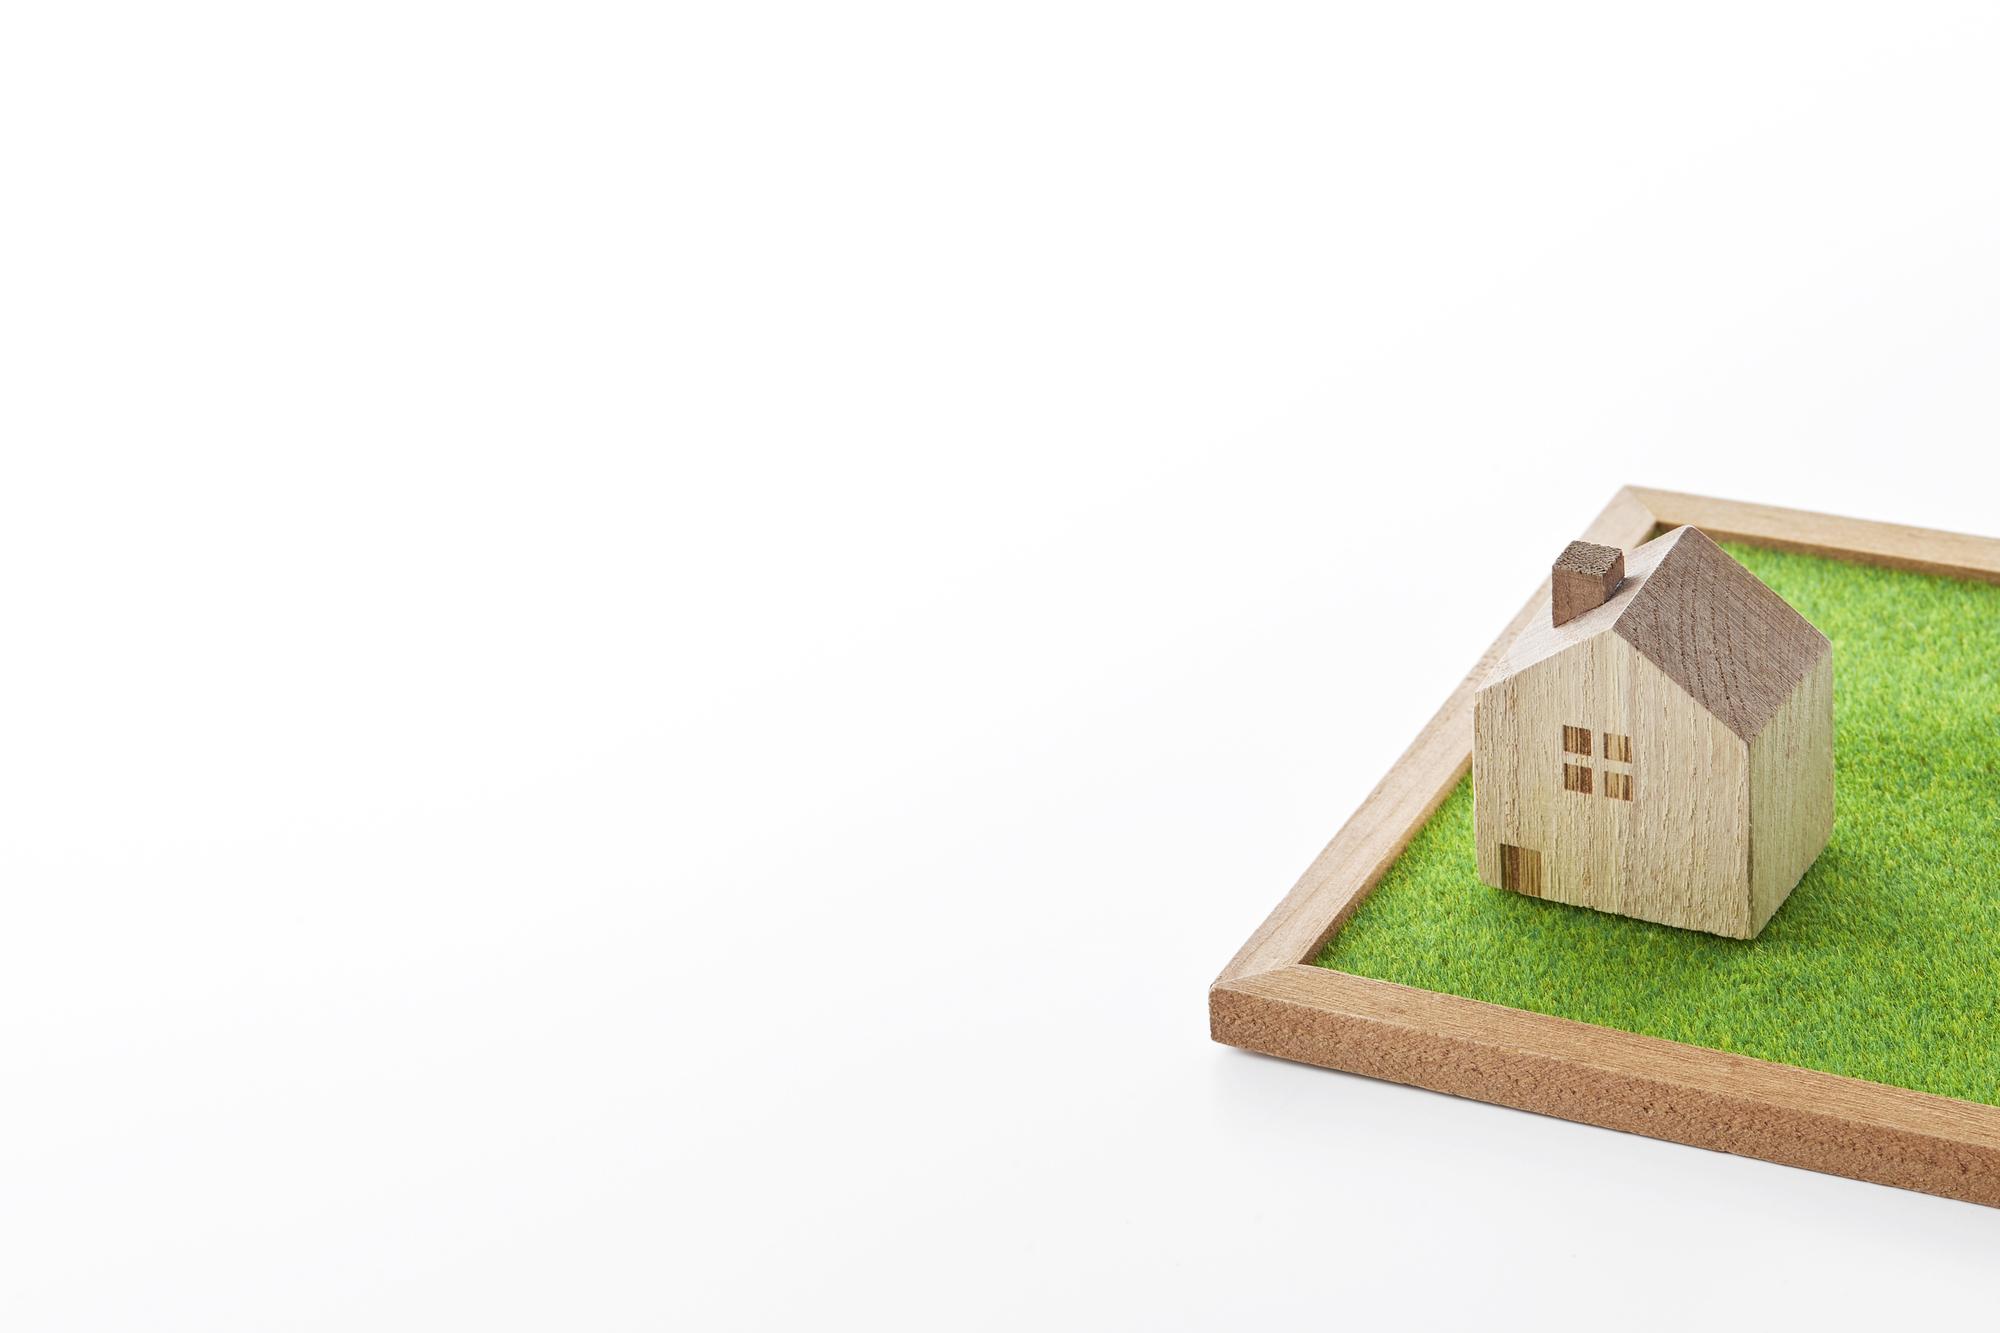 "<span class=""title"">庭付き注文住宅を建てる際に知っておきたいポイントと注意点</span>"